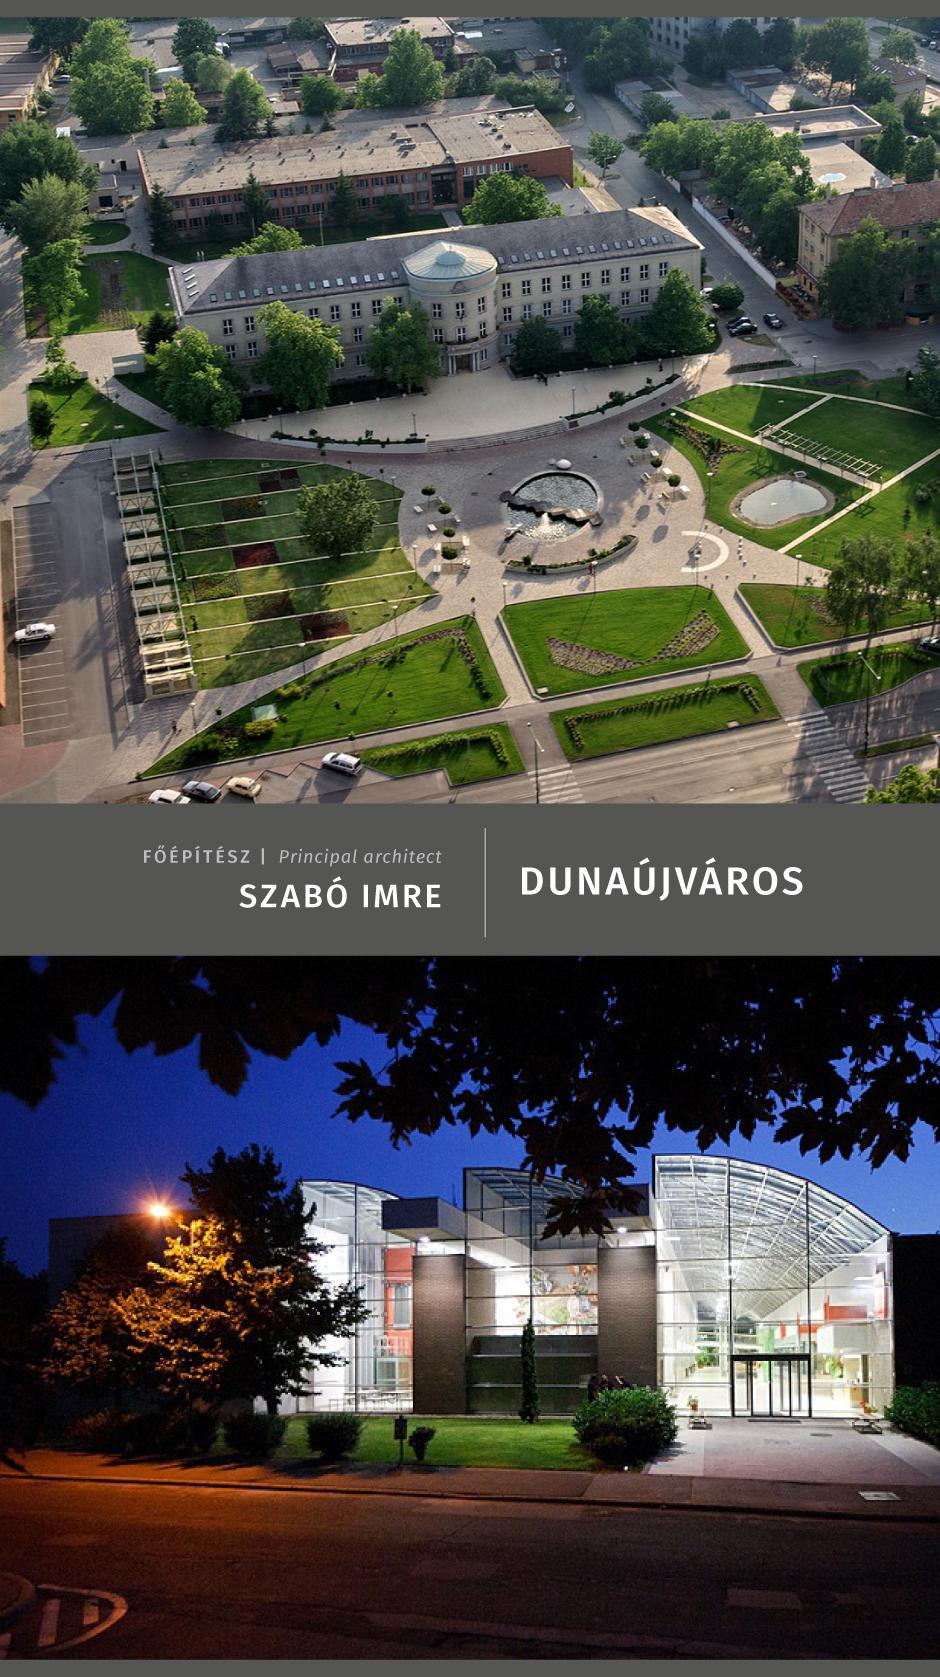 tablo_dunaujvaros-940x1677